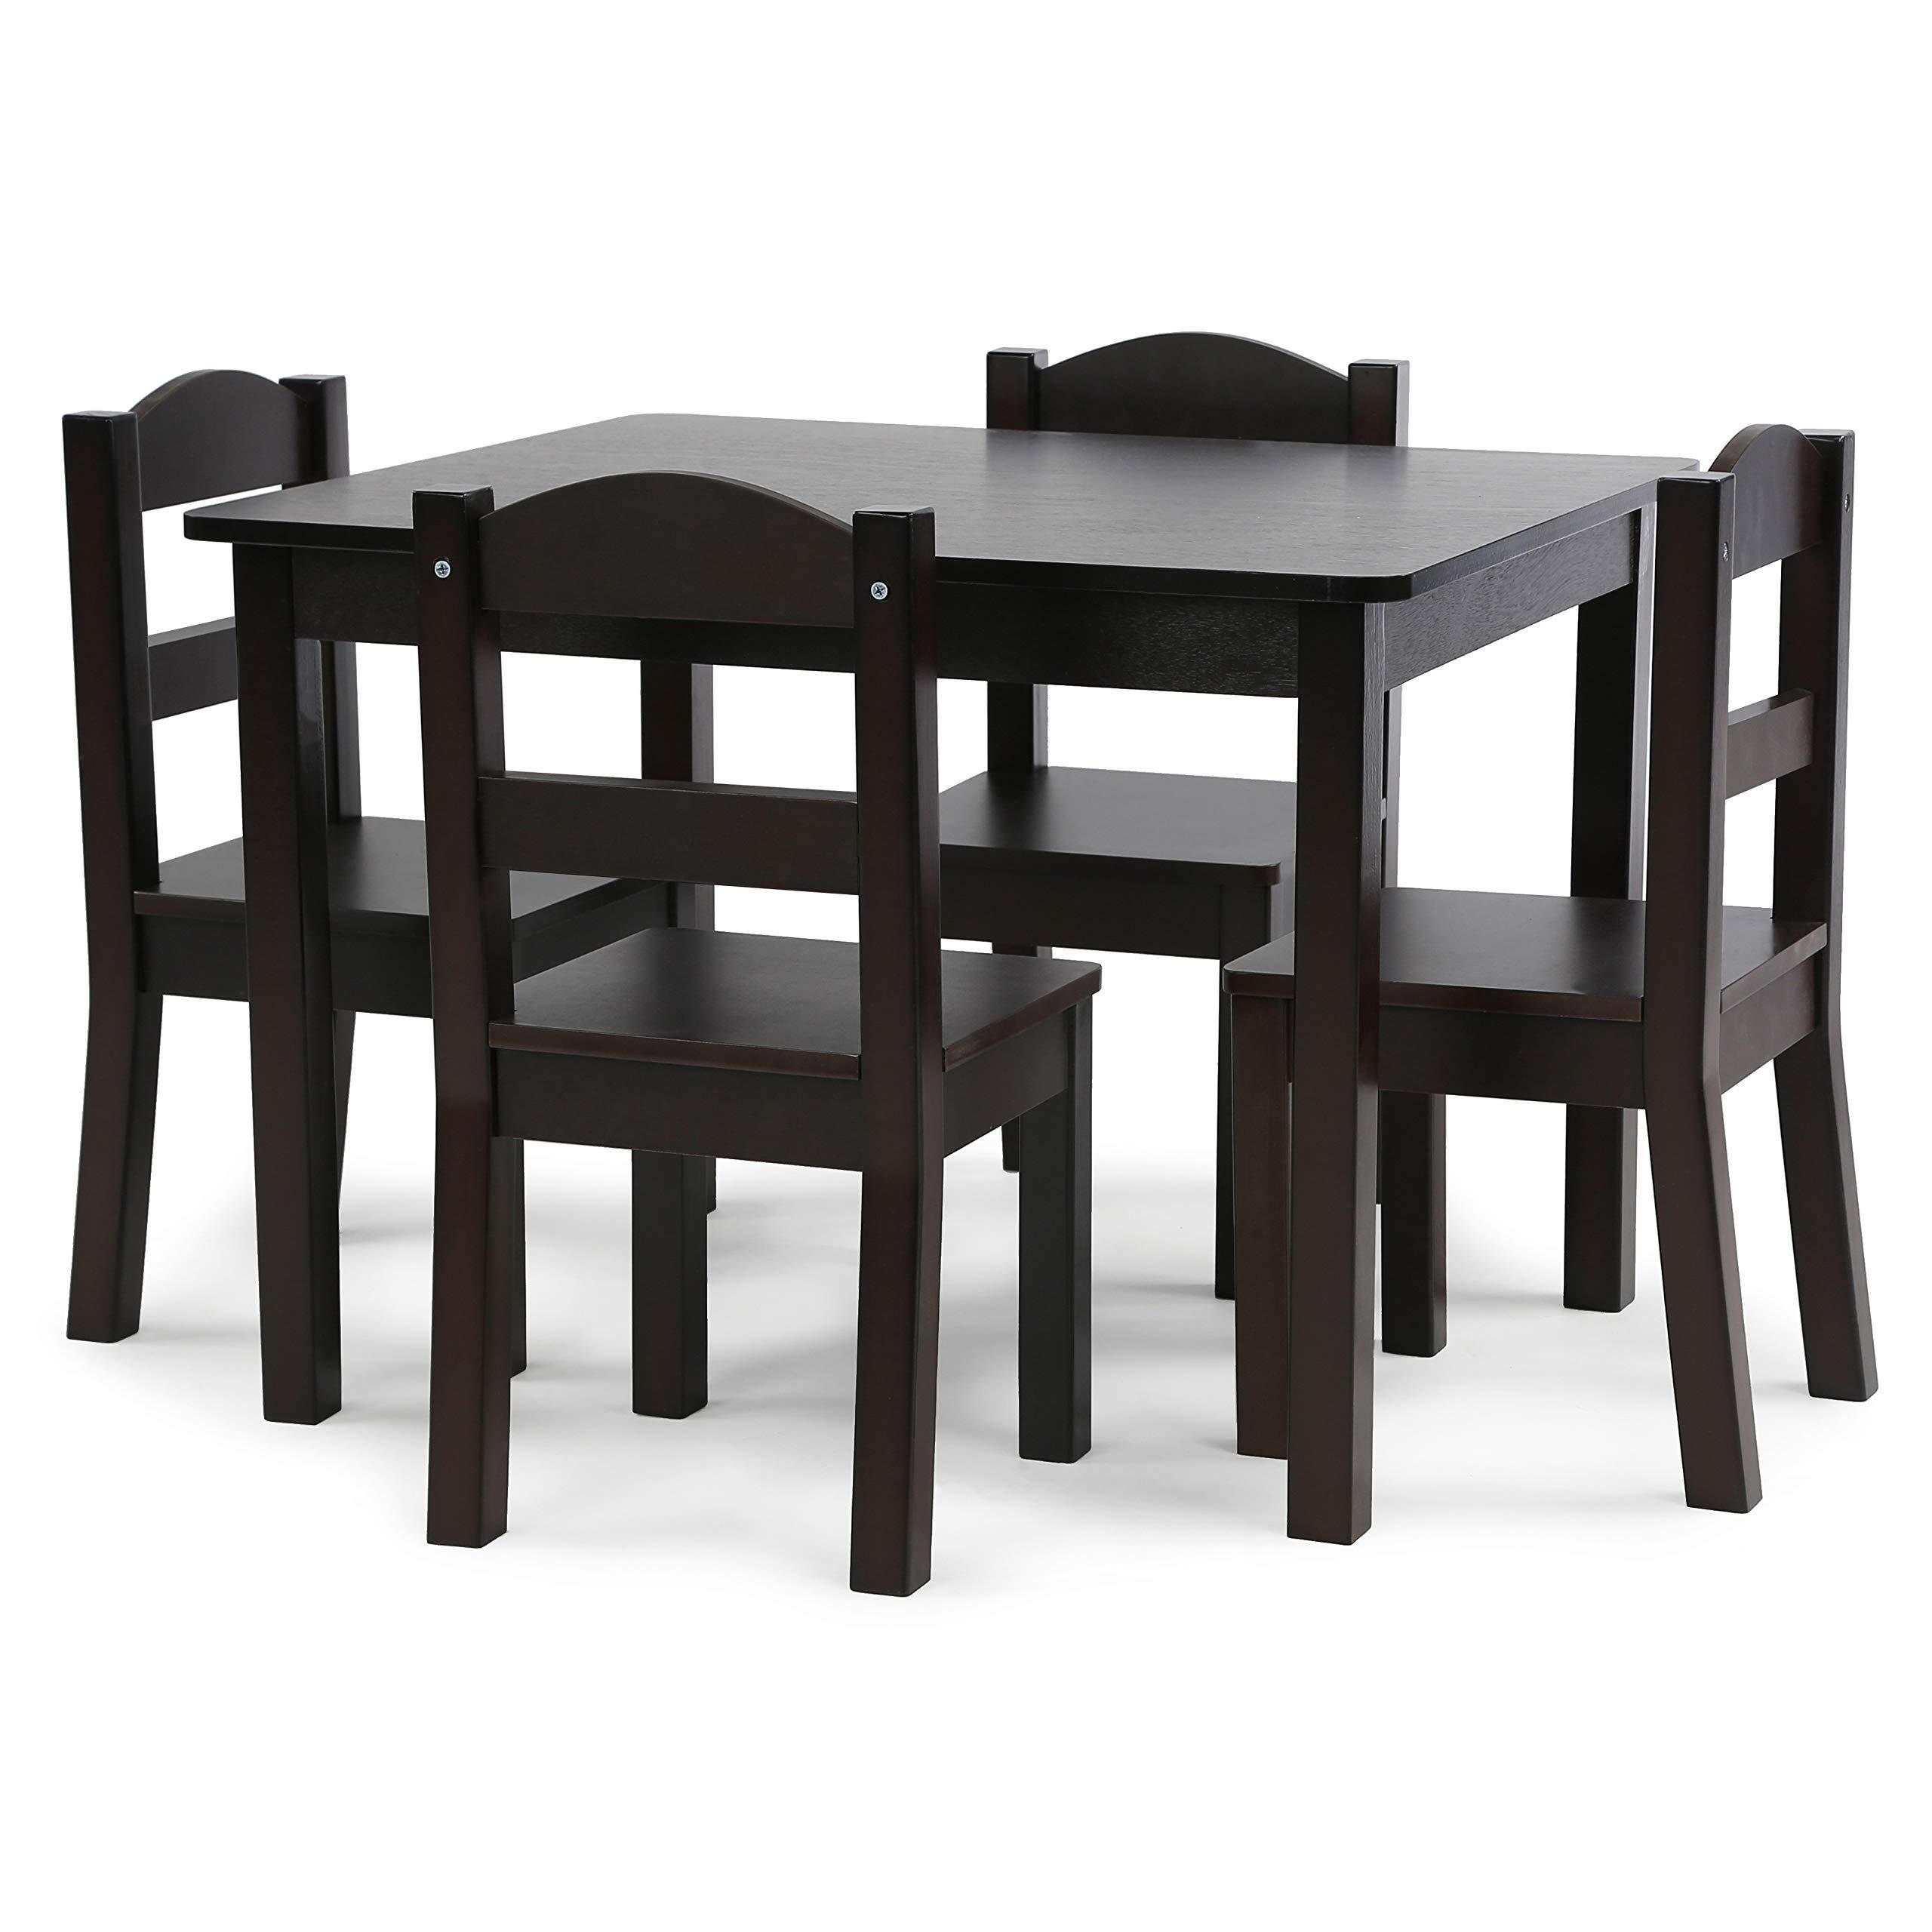 Tot Tutors TC824 Espresso Collection Kids Wood Table & 4 Chair Set, Espresso by Tot Tutors